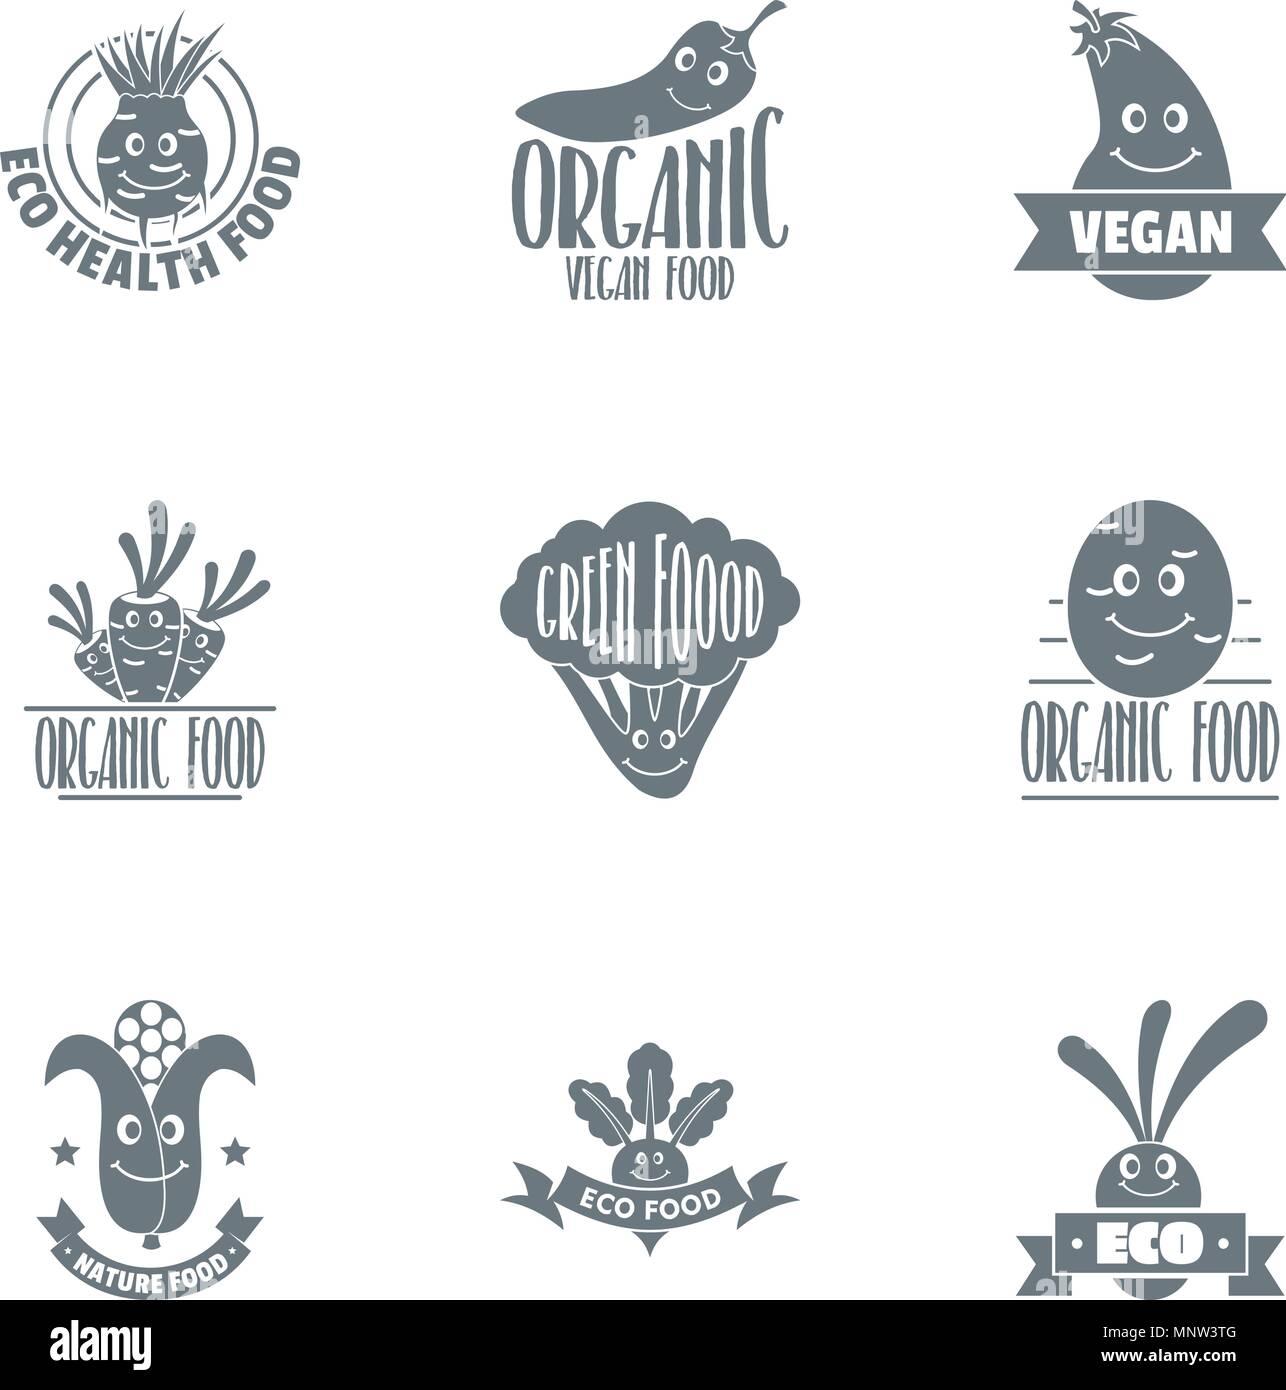 Organo logo, estilo sencillo Imagen De Stock